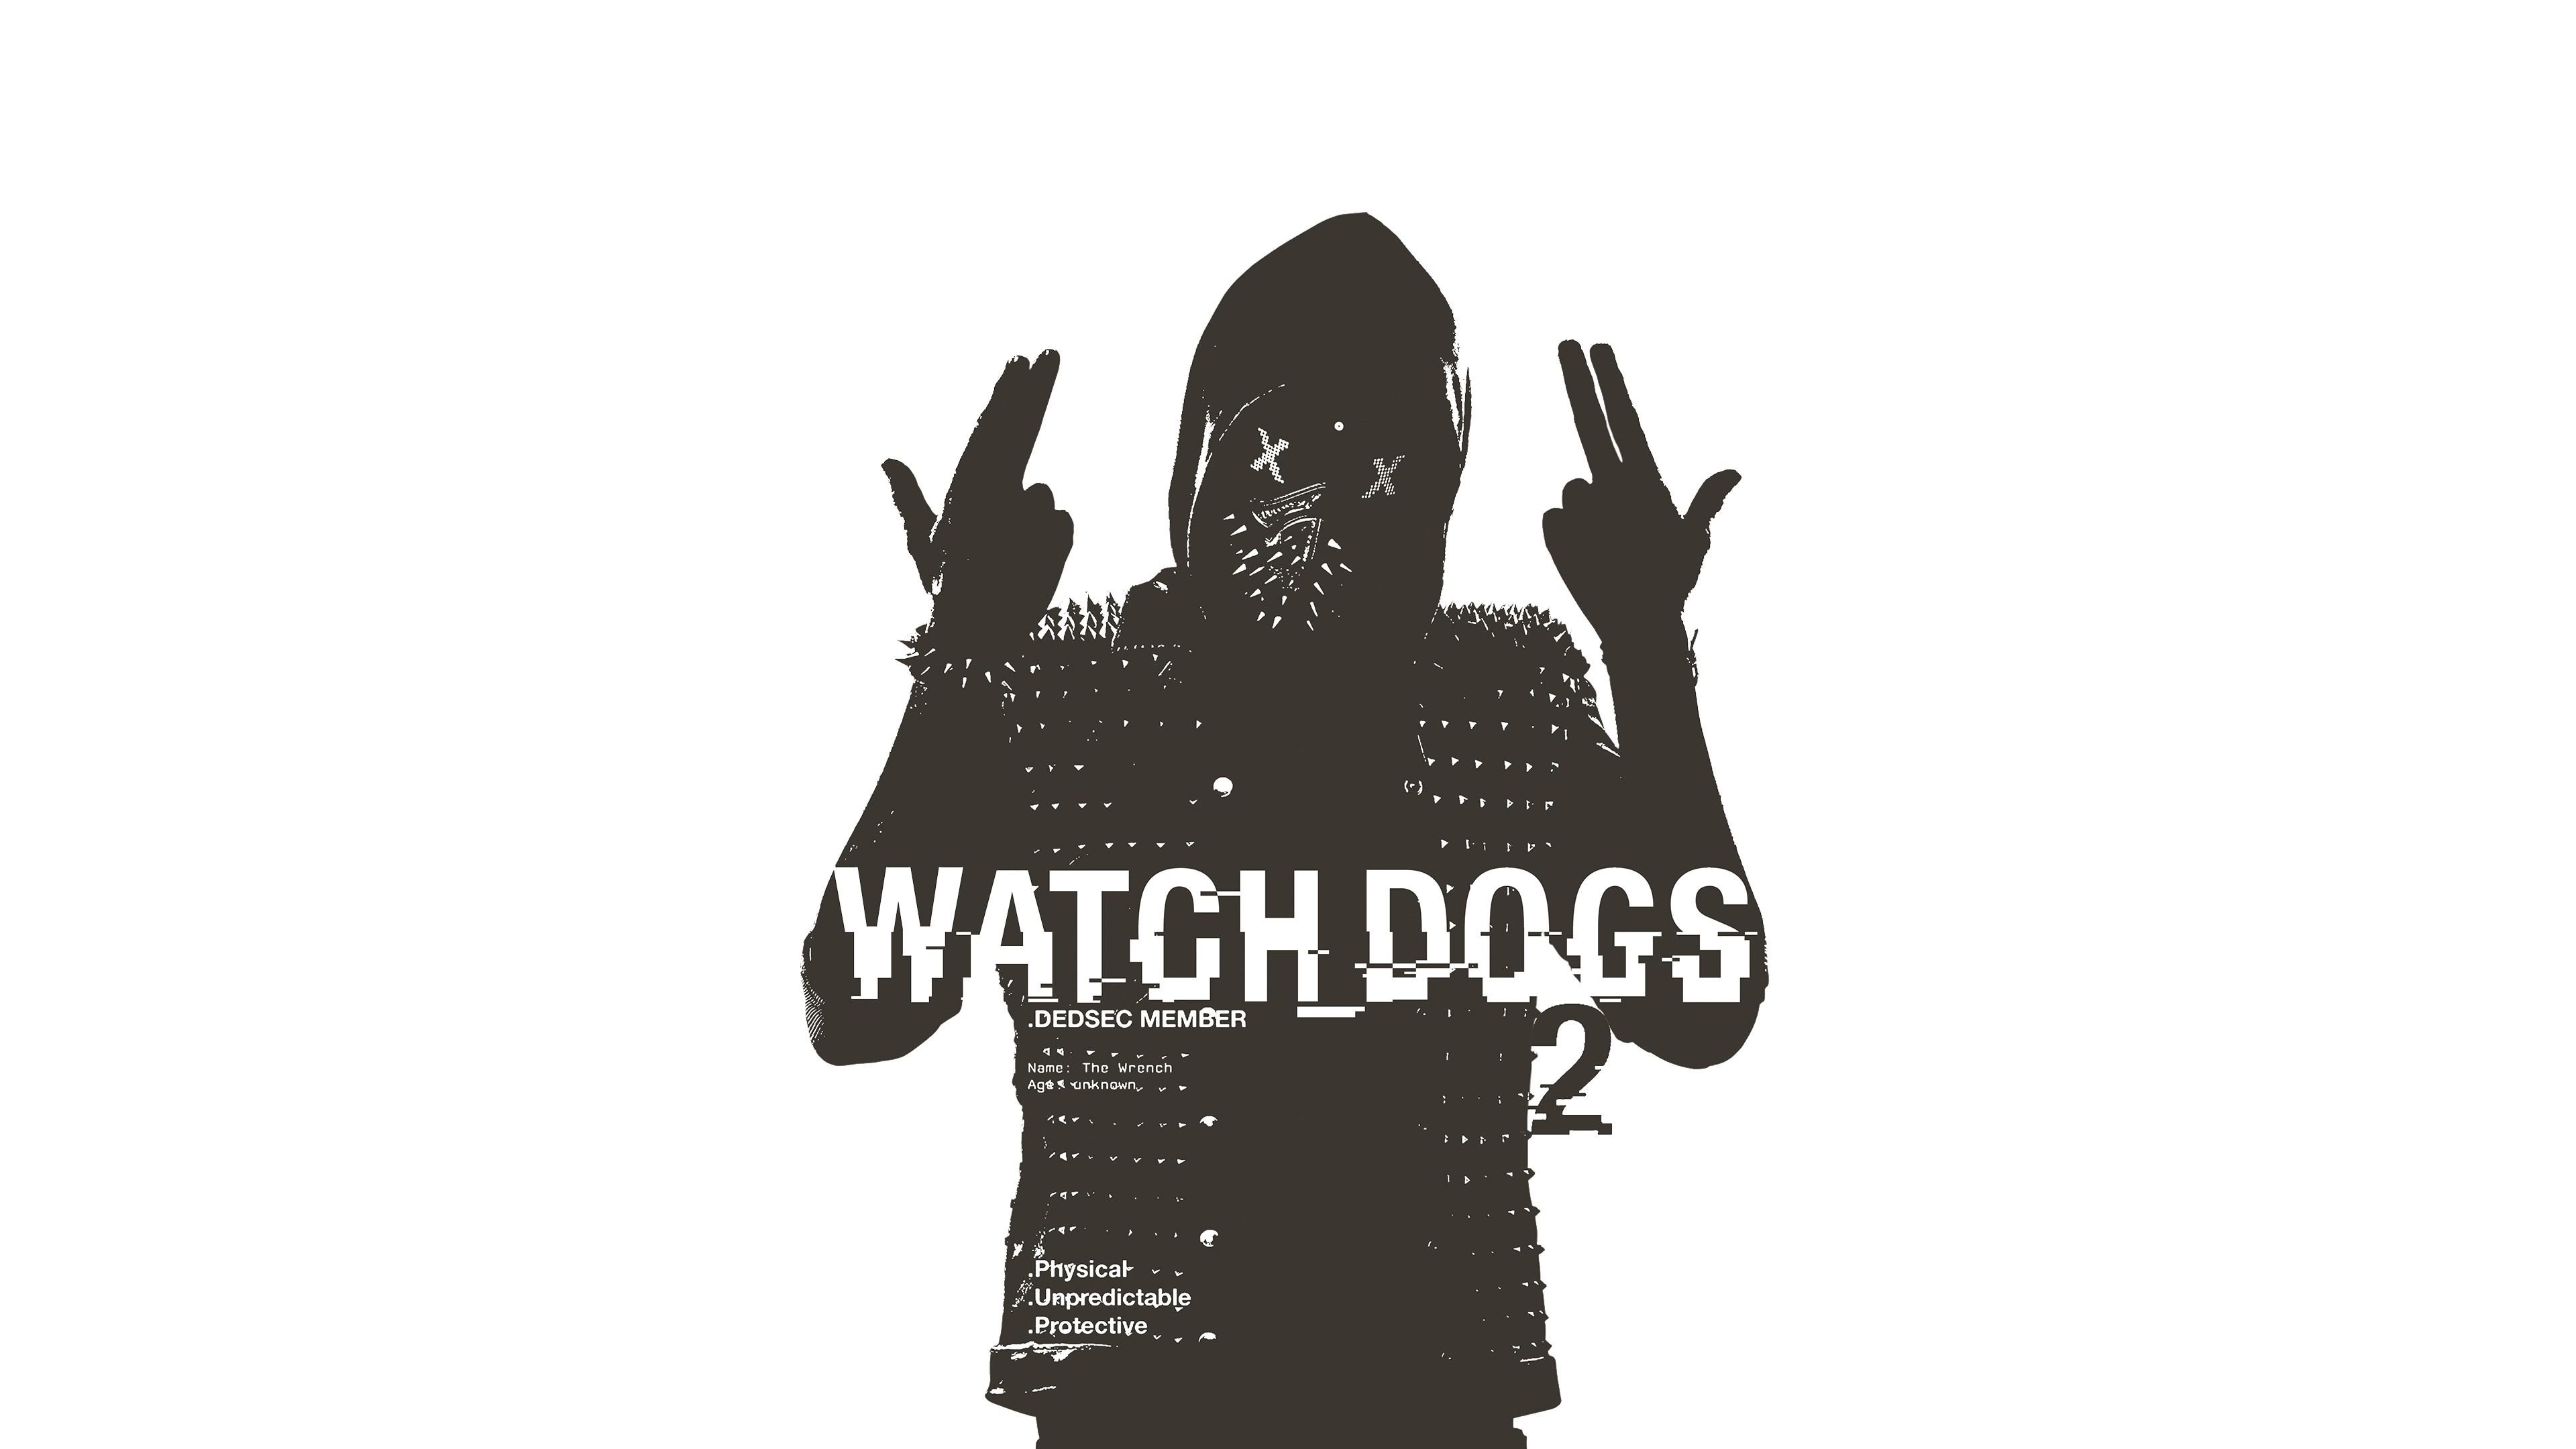 Download 3840x2400 Wallpaper Watch Dogs 2 Gaming Monochrome 4 K